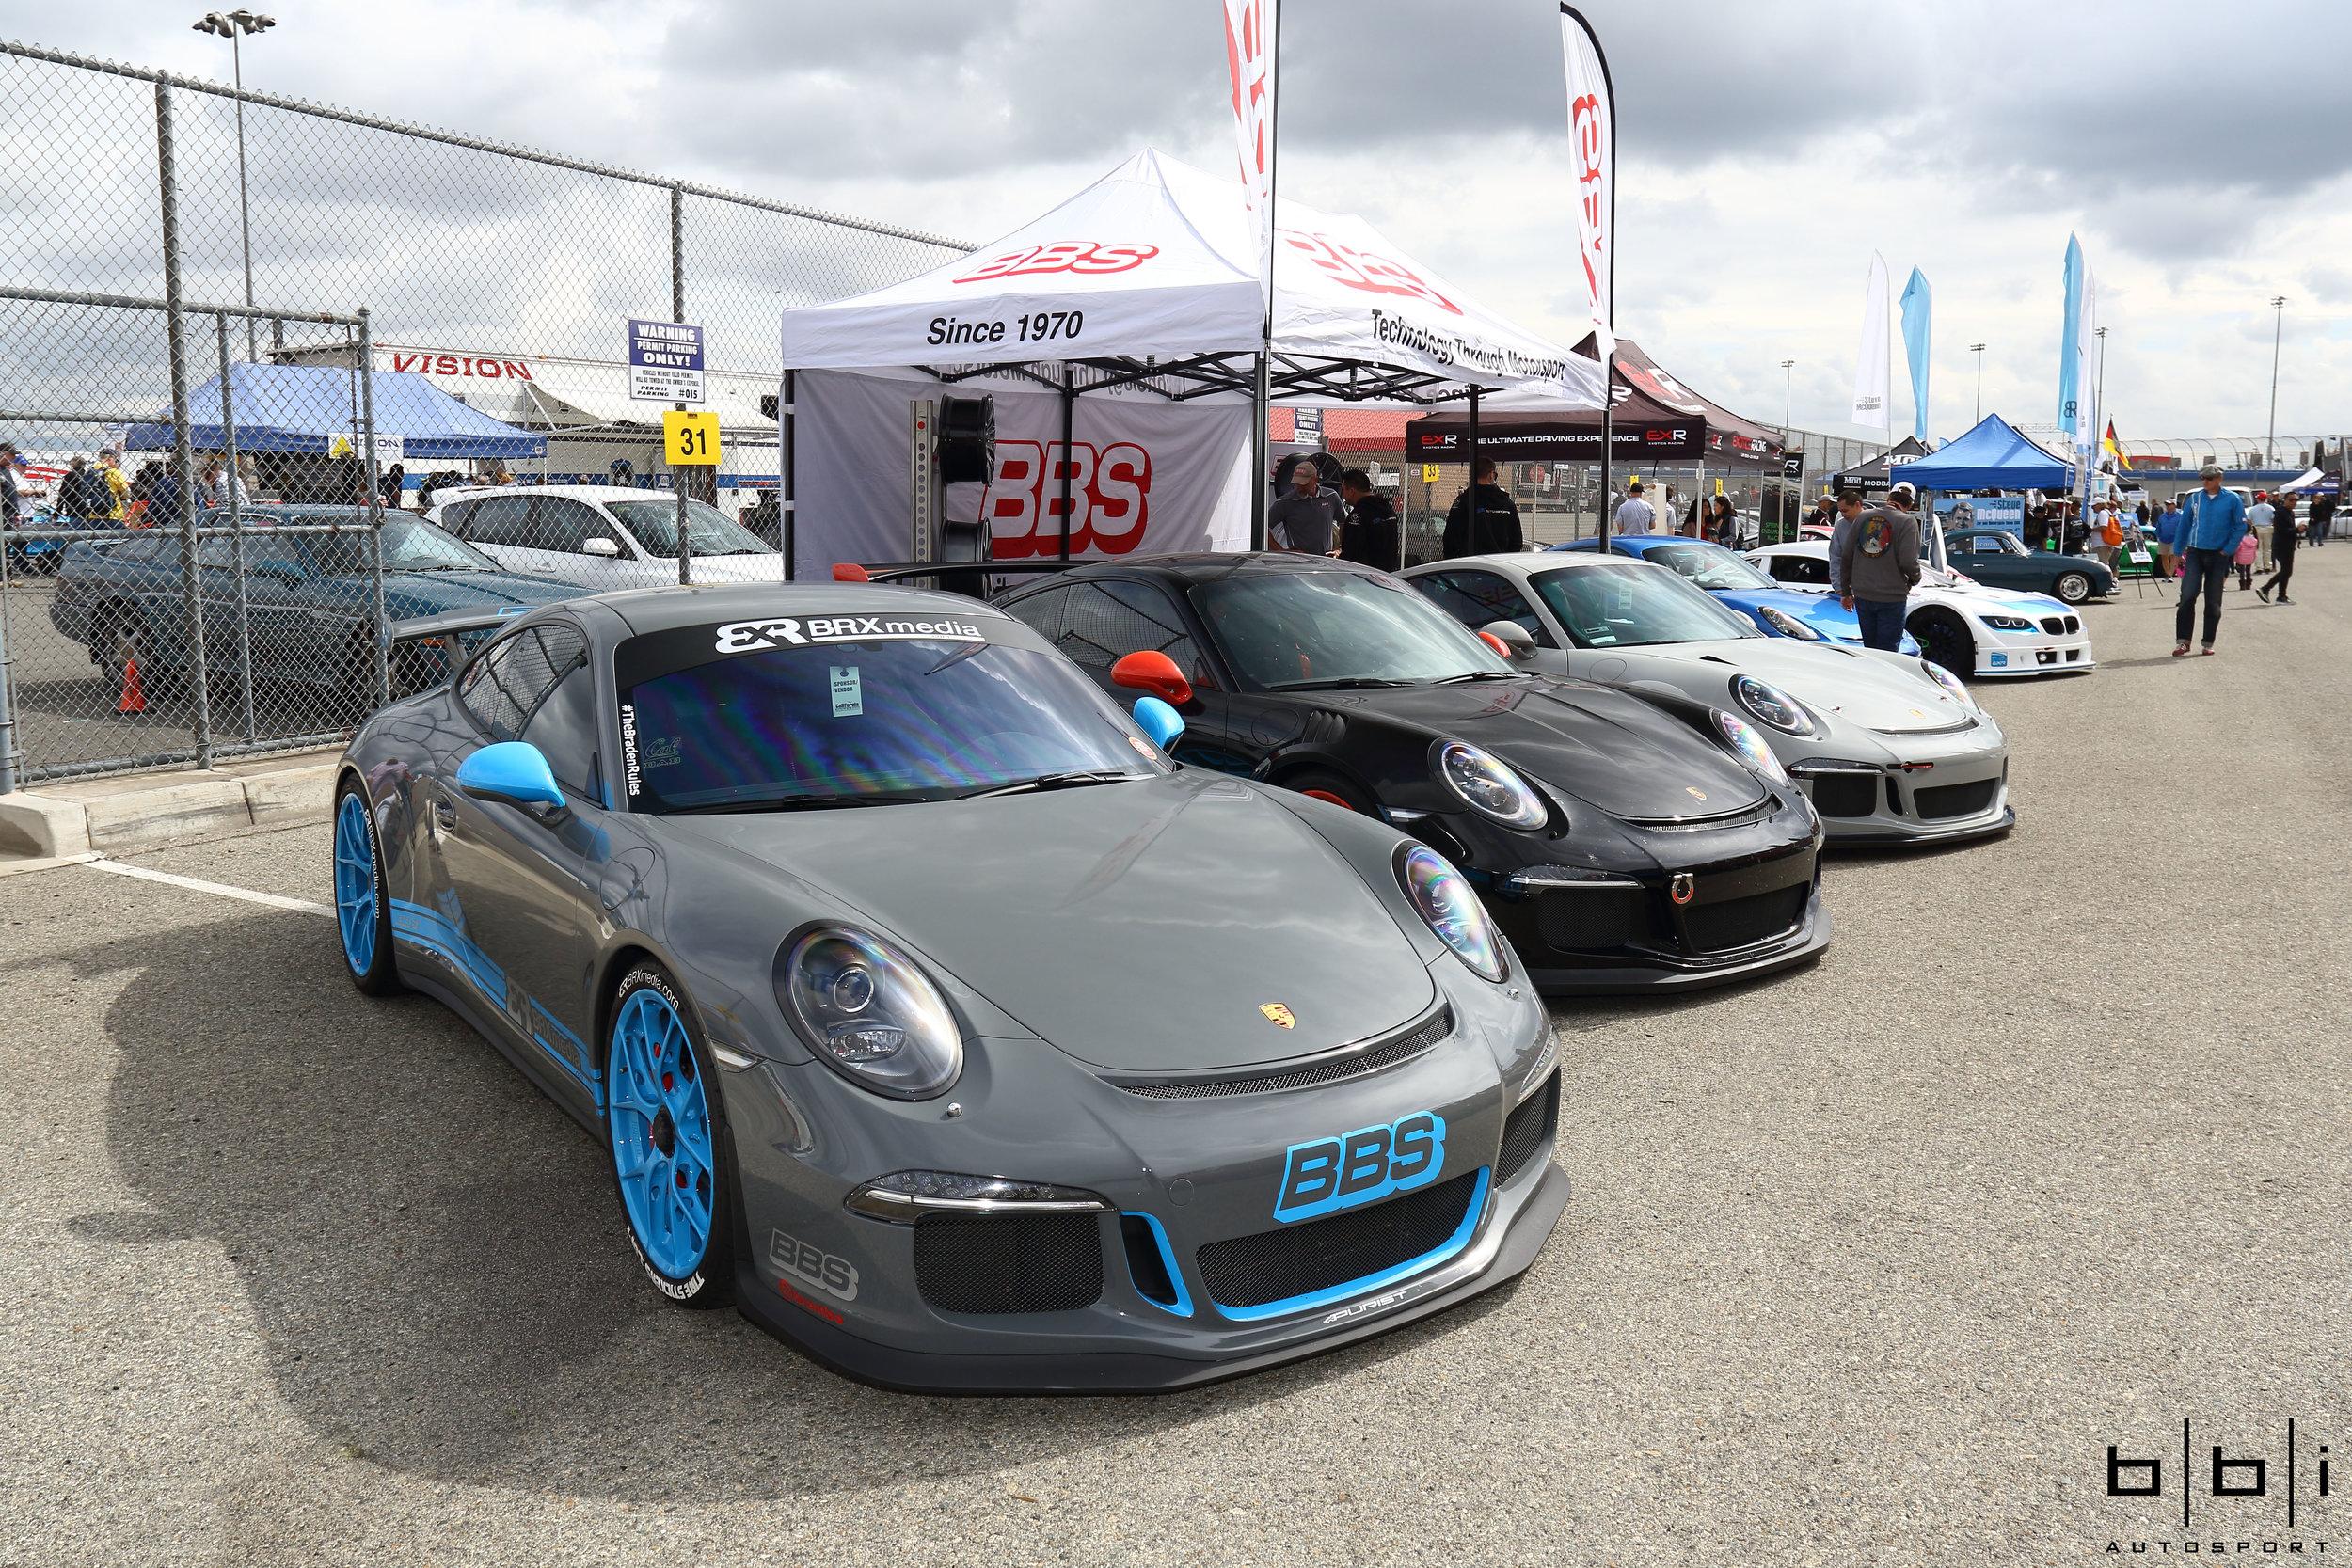 Few Porsche 991 GT3's with BBS FI-R Wheels at BBS Wheels' Booth